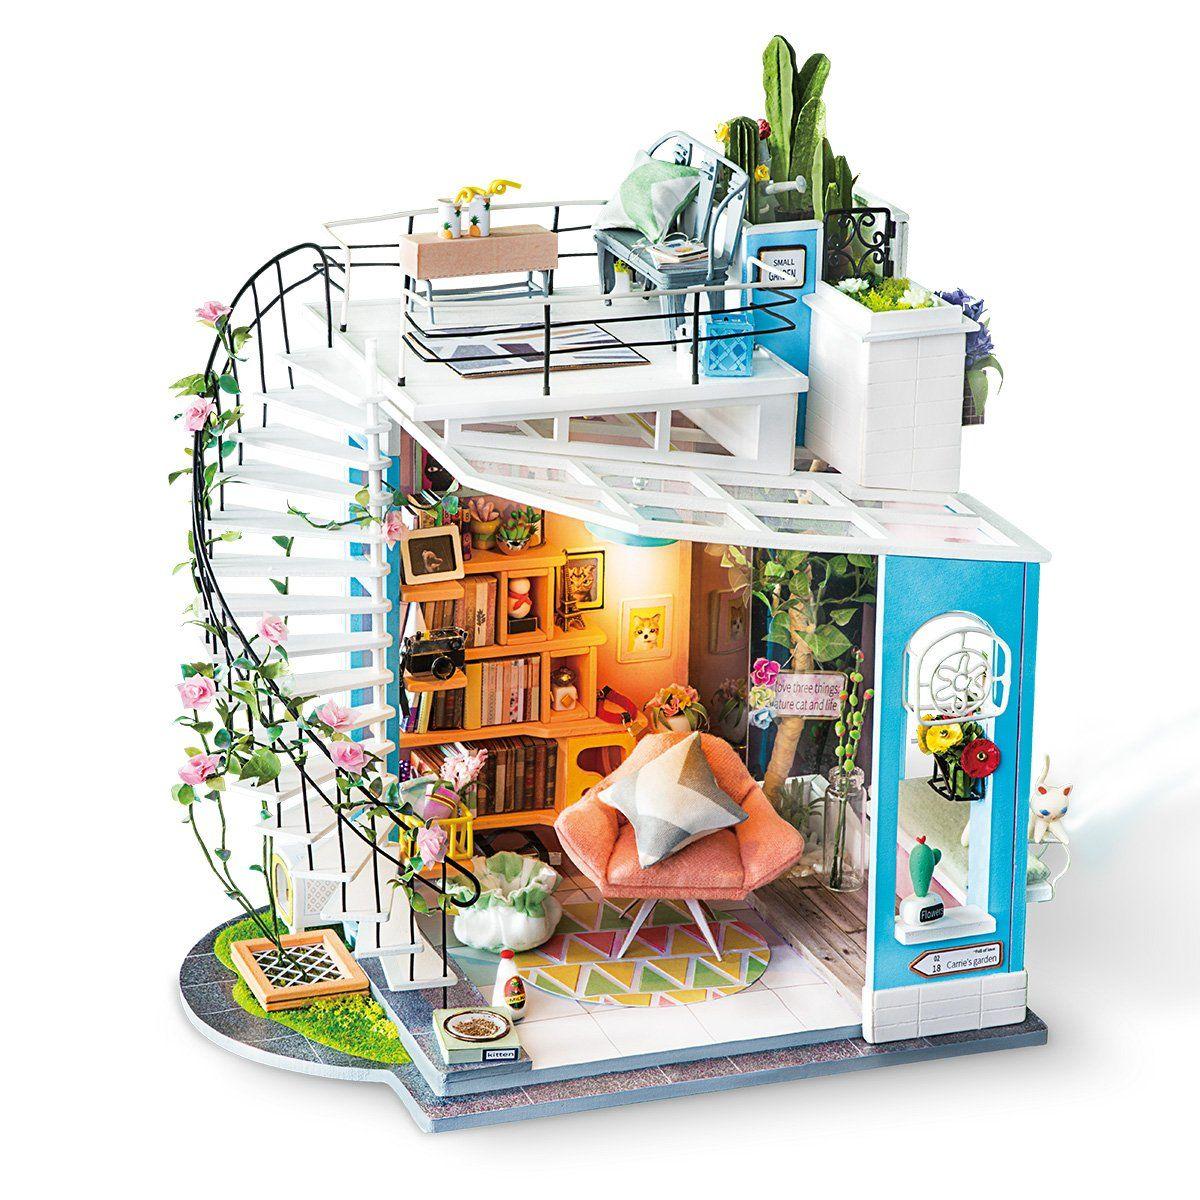 Dora's Loft Robotime DIY Miniature Dollhouse Kit